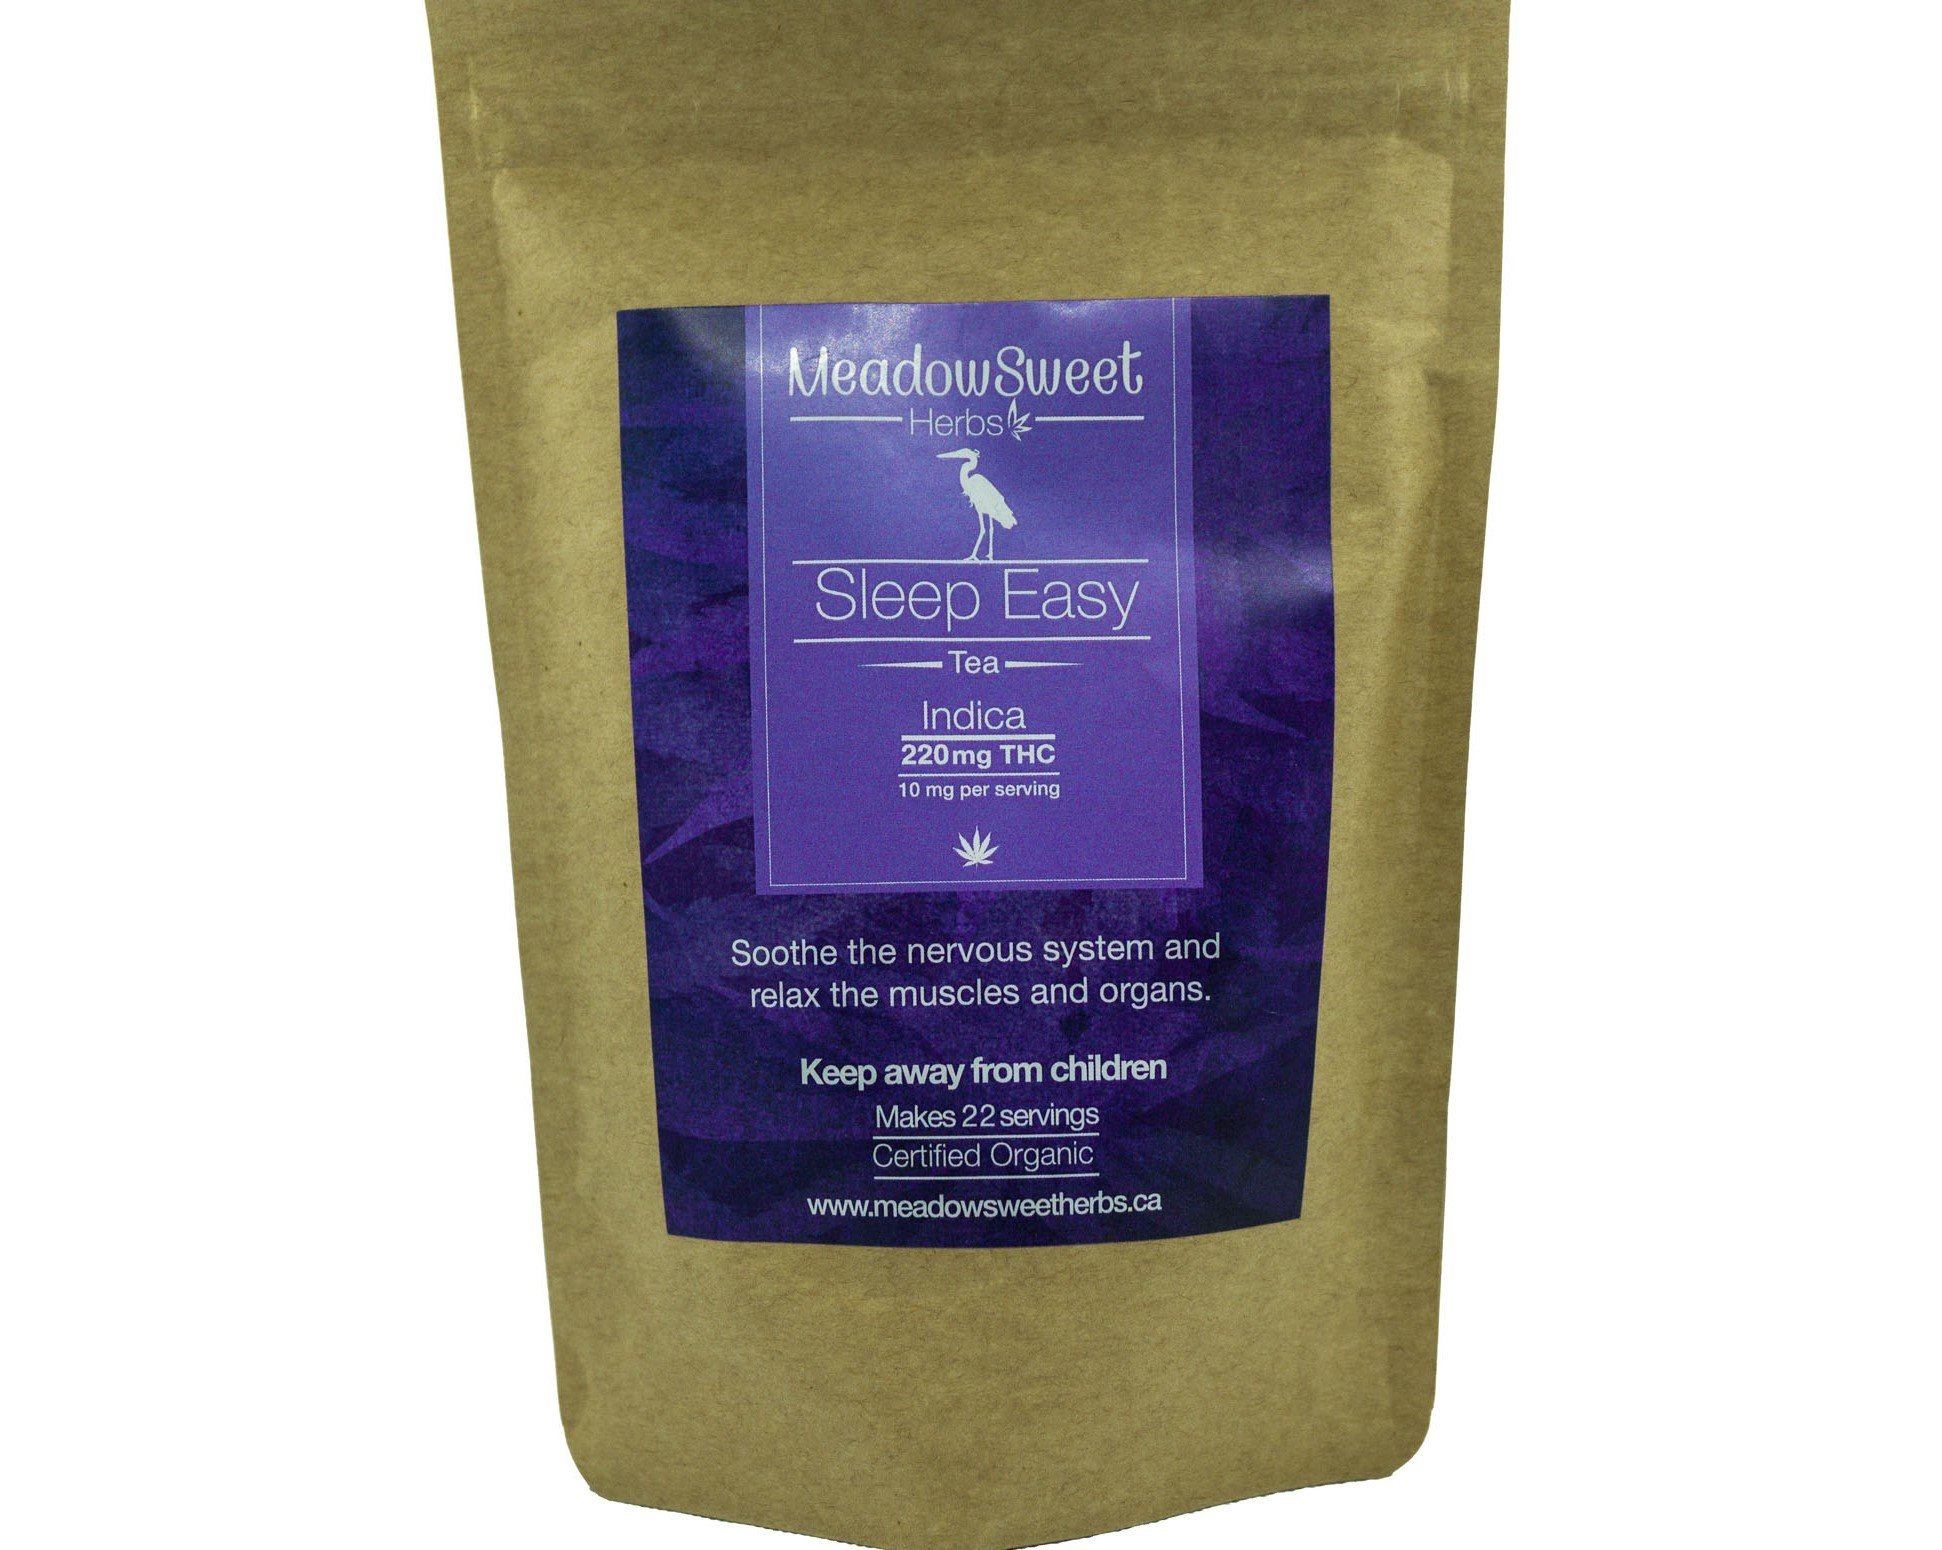 Sleep Easy Tea by MeadowSweet Herbs (220mg THC) 01153